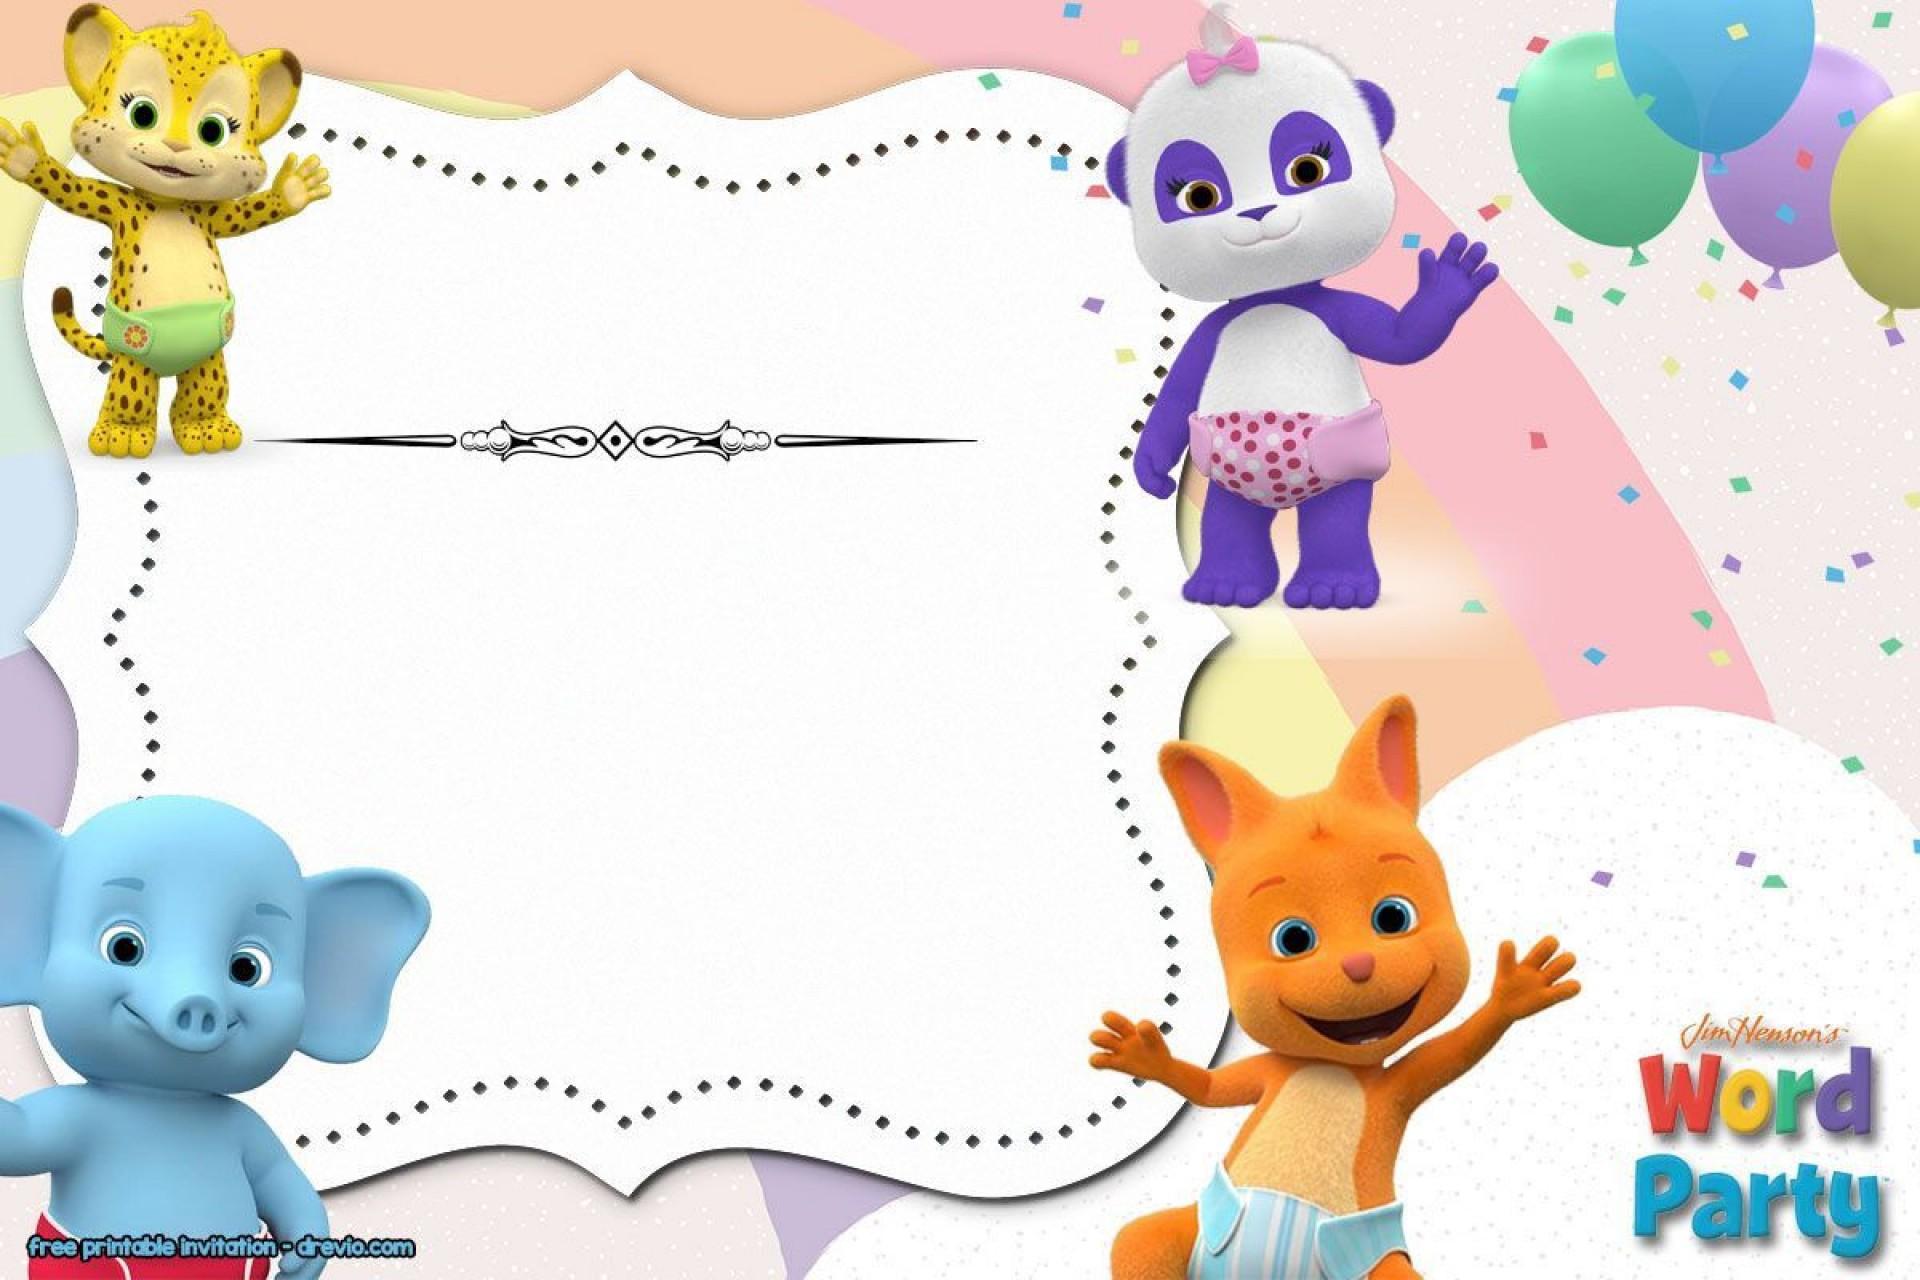 005 Surprising Microsoft Word Birthday Invitation Template Image  Editable 50th 60th1920